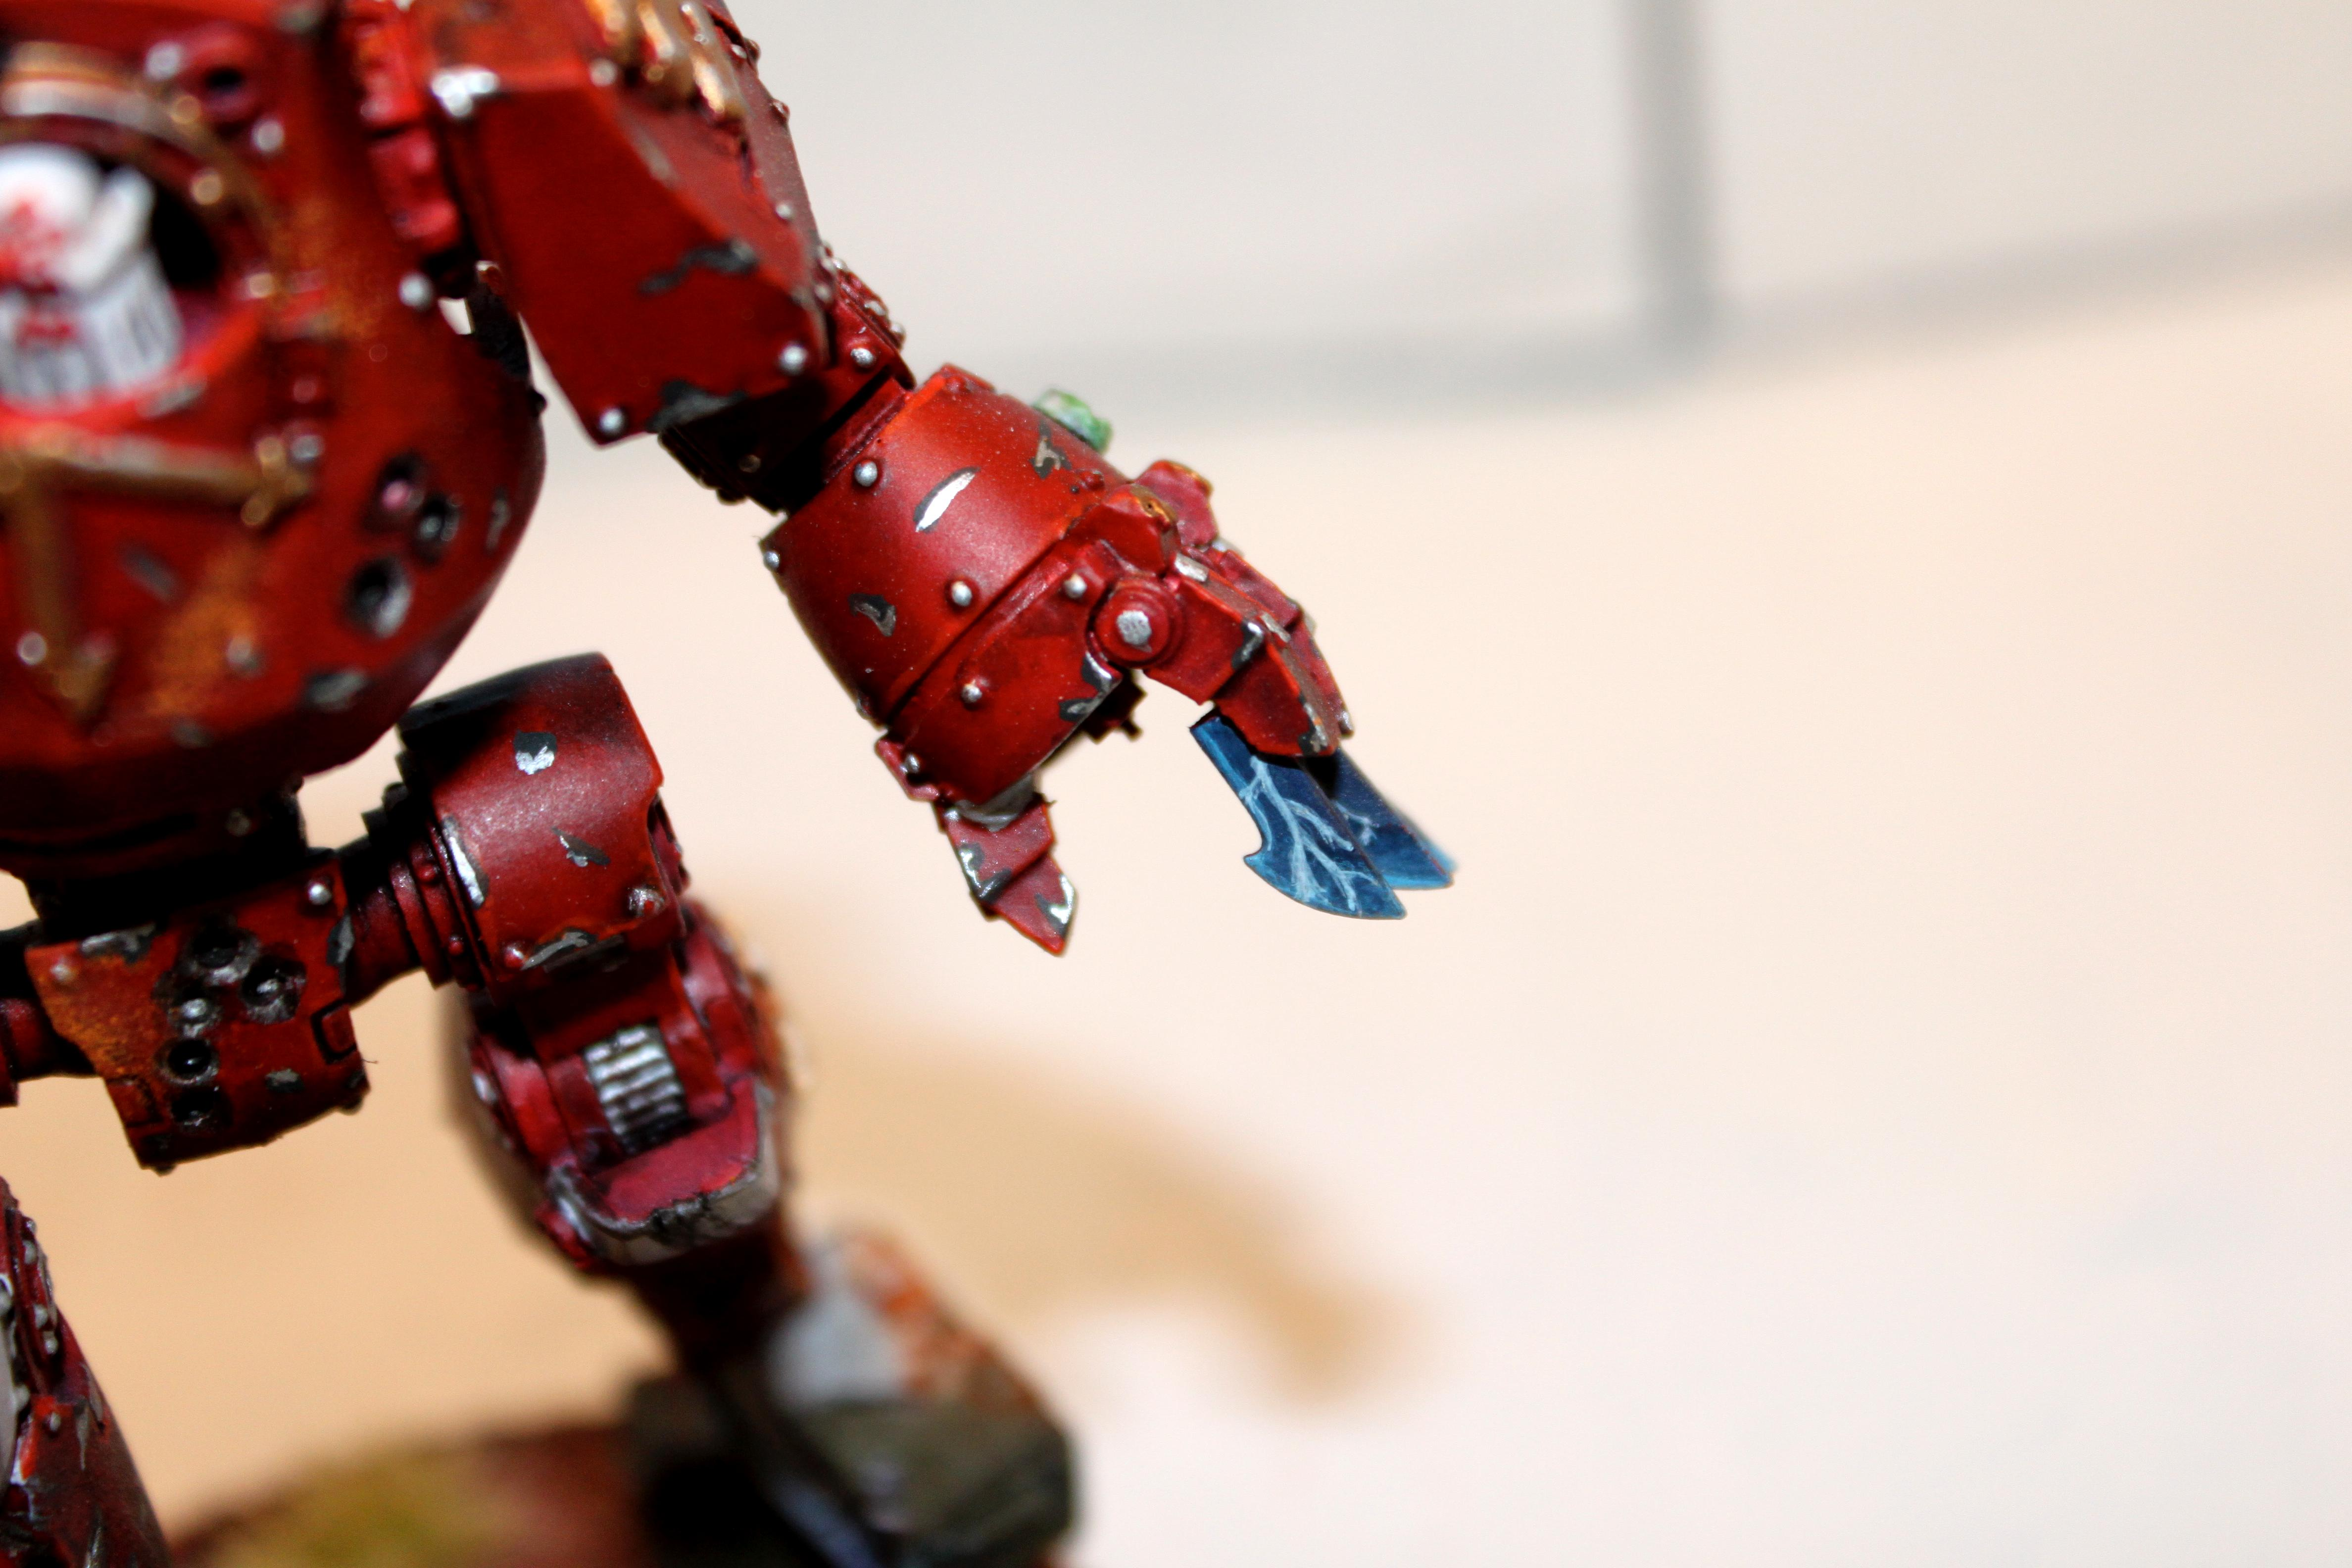 Battle Damage, Claws, Contemptor, Fingernails, Power, Red, Space Marines, Stealershock, Warhammer 40,000